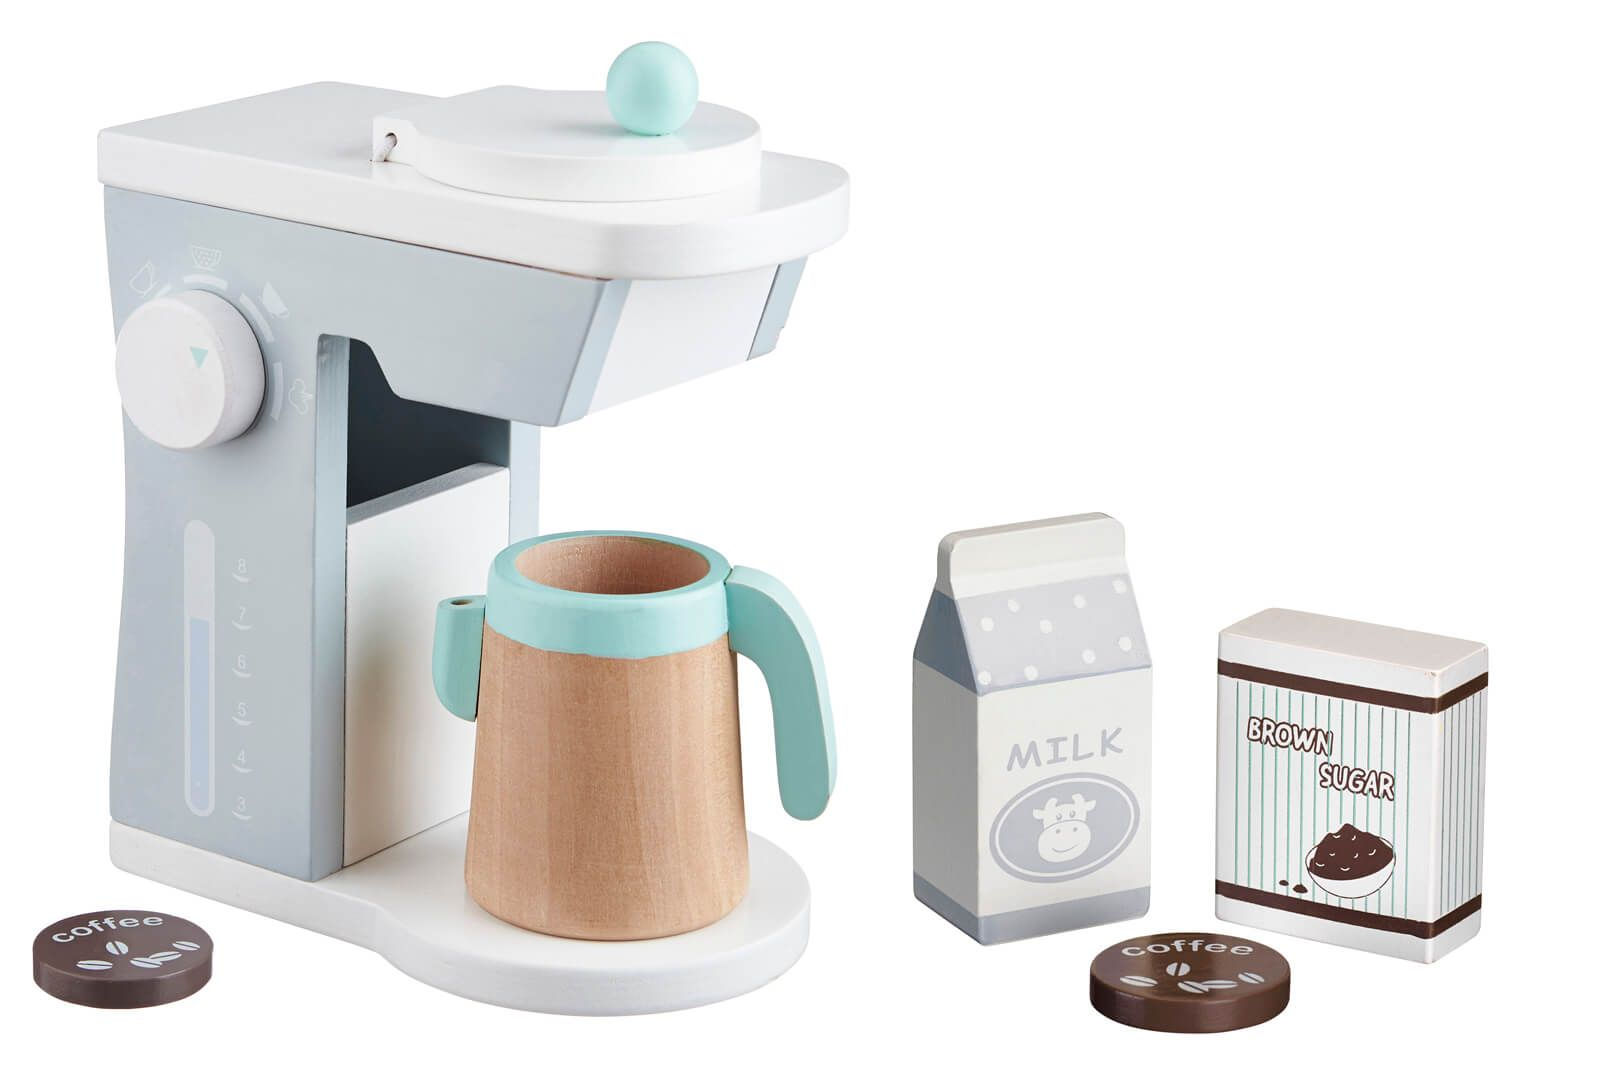 Houten Speelgoed Keuken : Koffiezetapparaat kids concept houten speelgoed keuken en